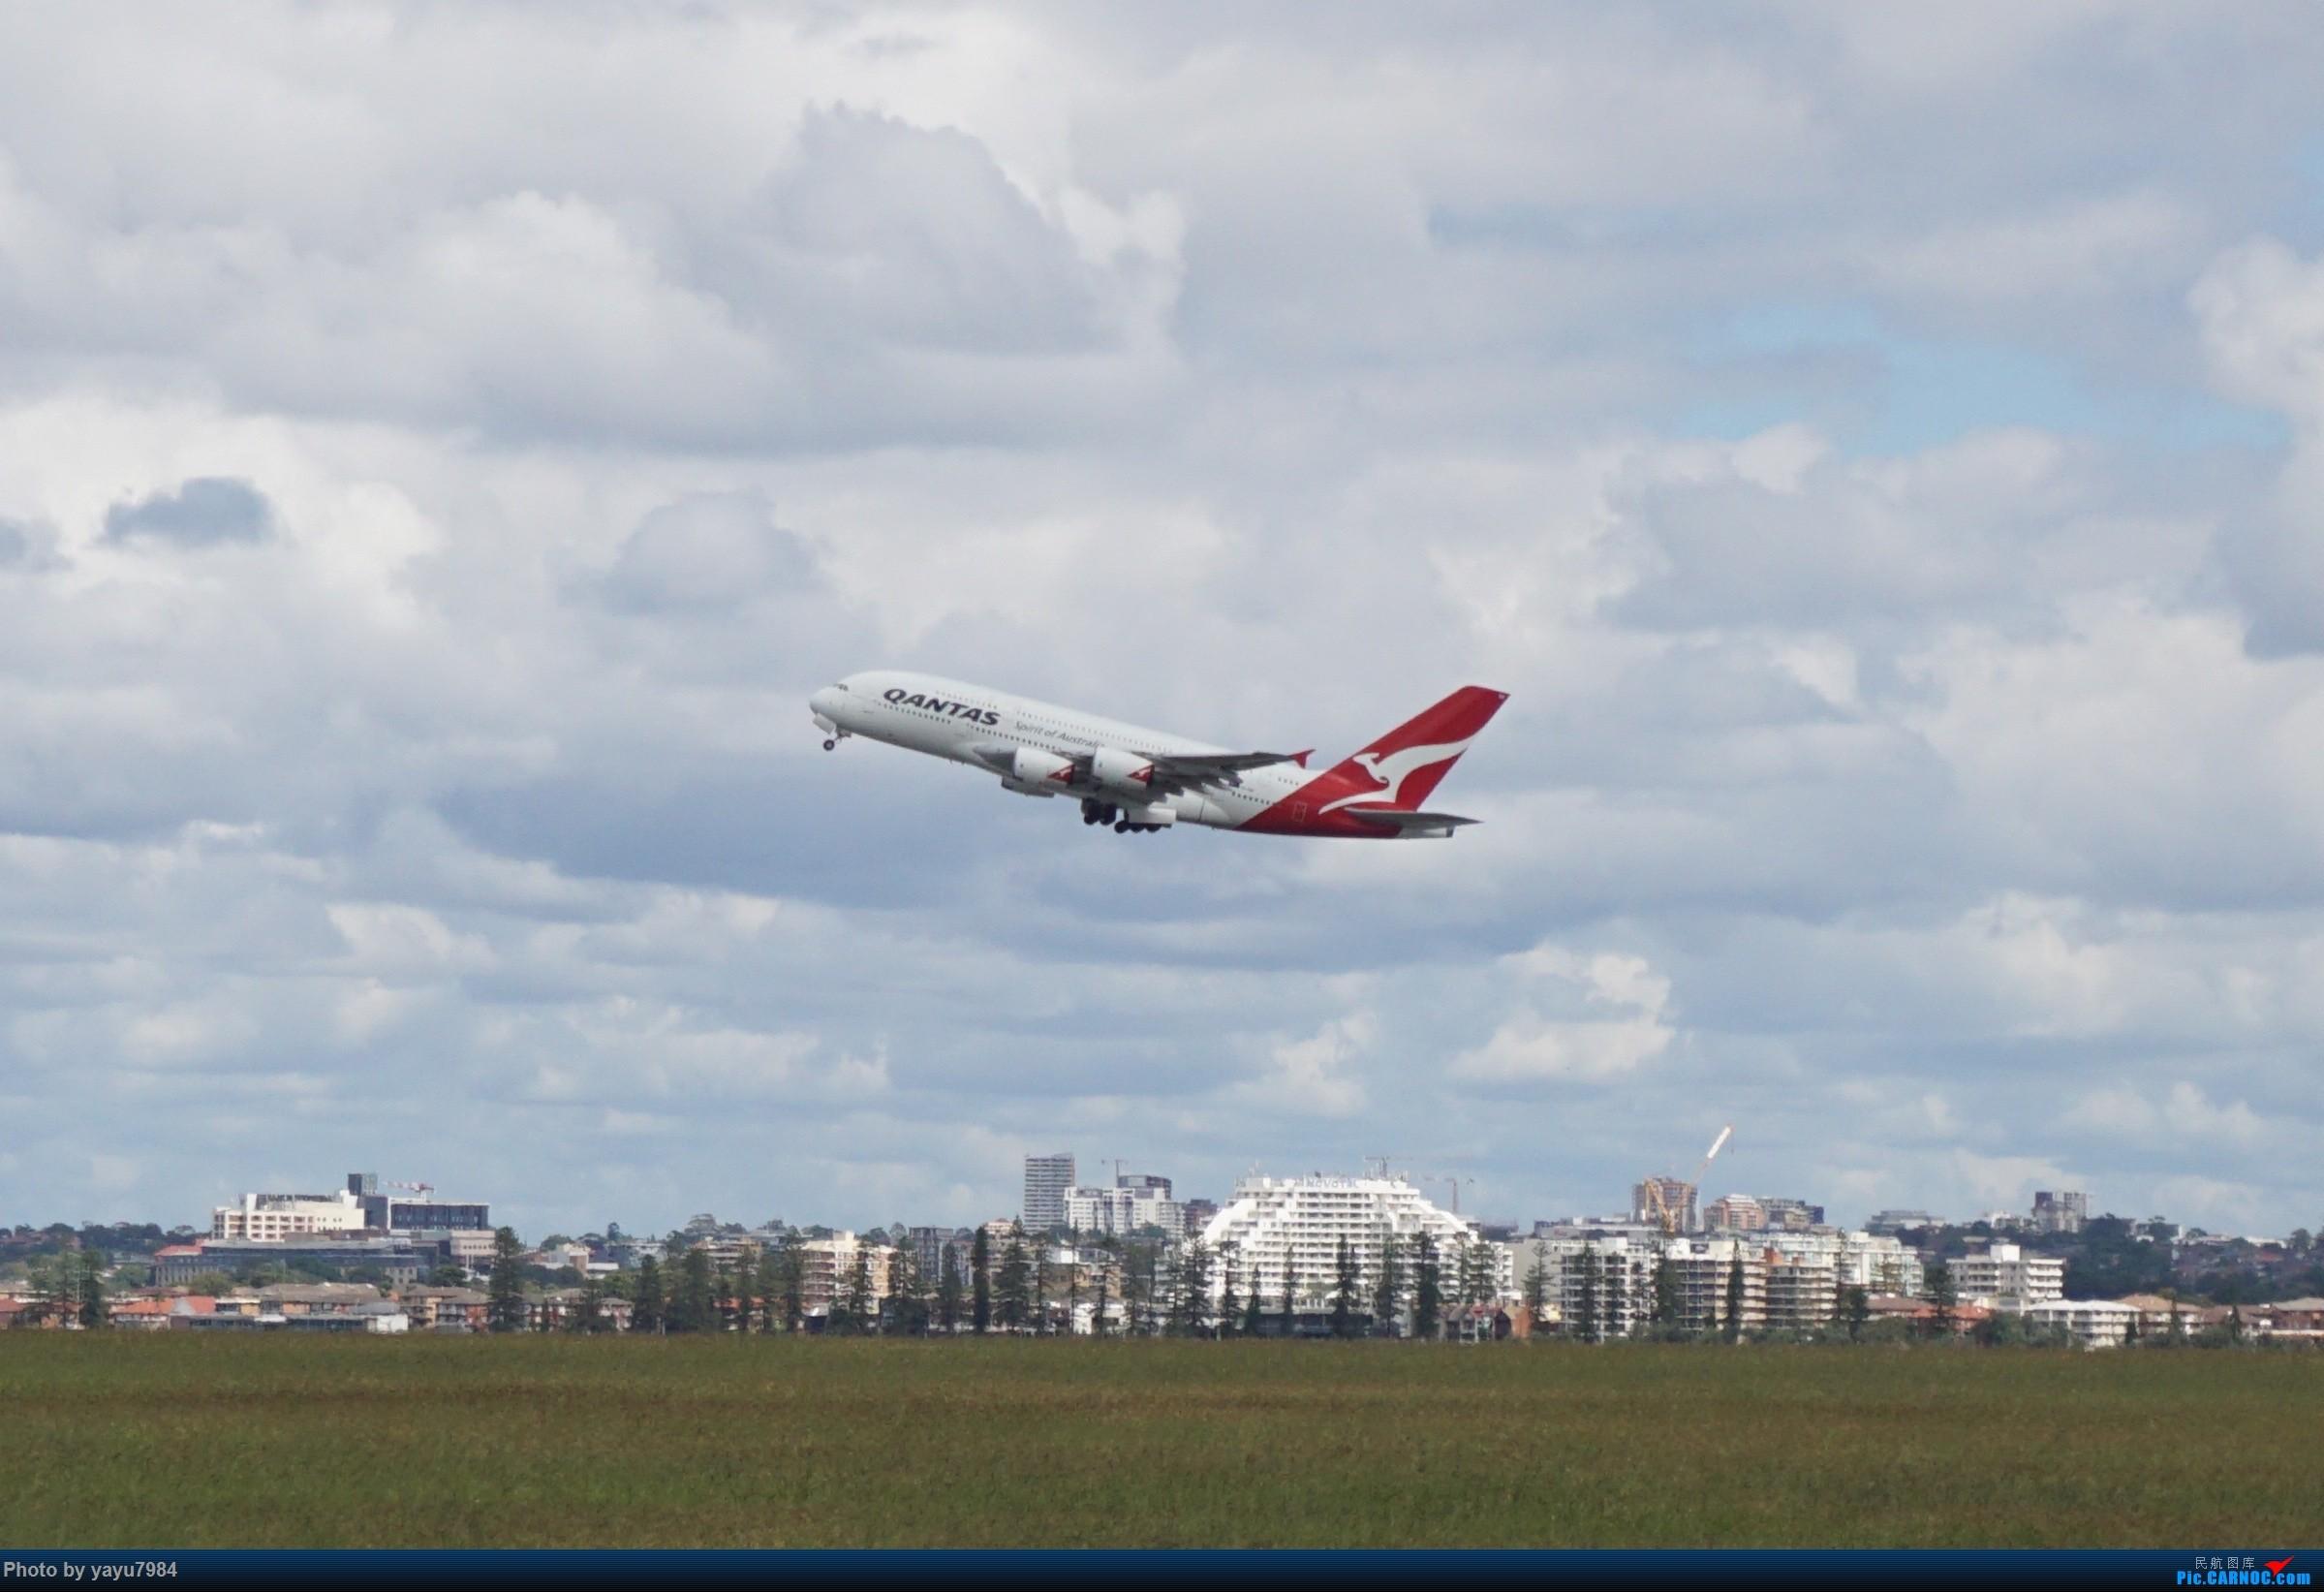 Re:[原创][SYD] 开帖分享一下16L/34R,以及07/25跑道周边的新拍机点位 AIRBUS A380-800 VH-OQK 澳大利亚悉尼金斯福德·史密斯机场